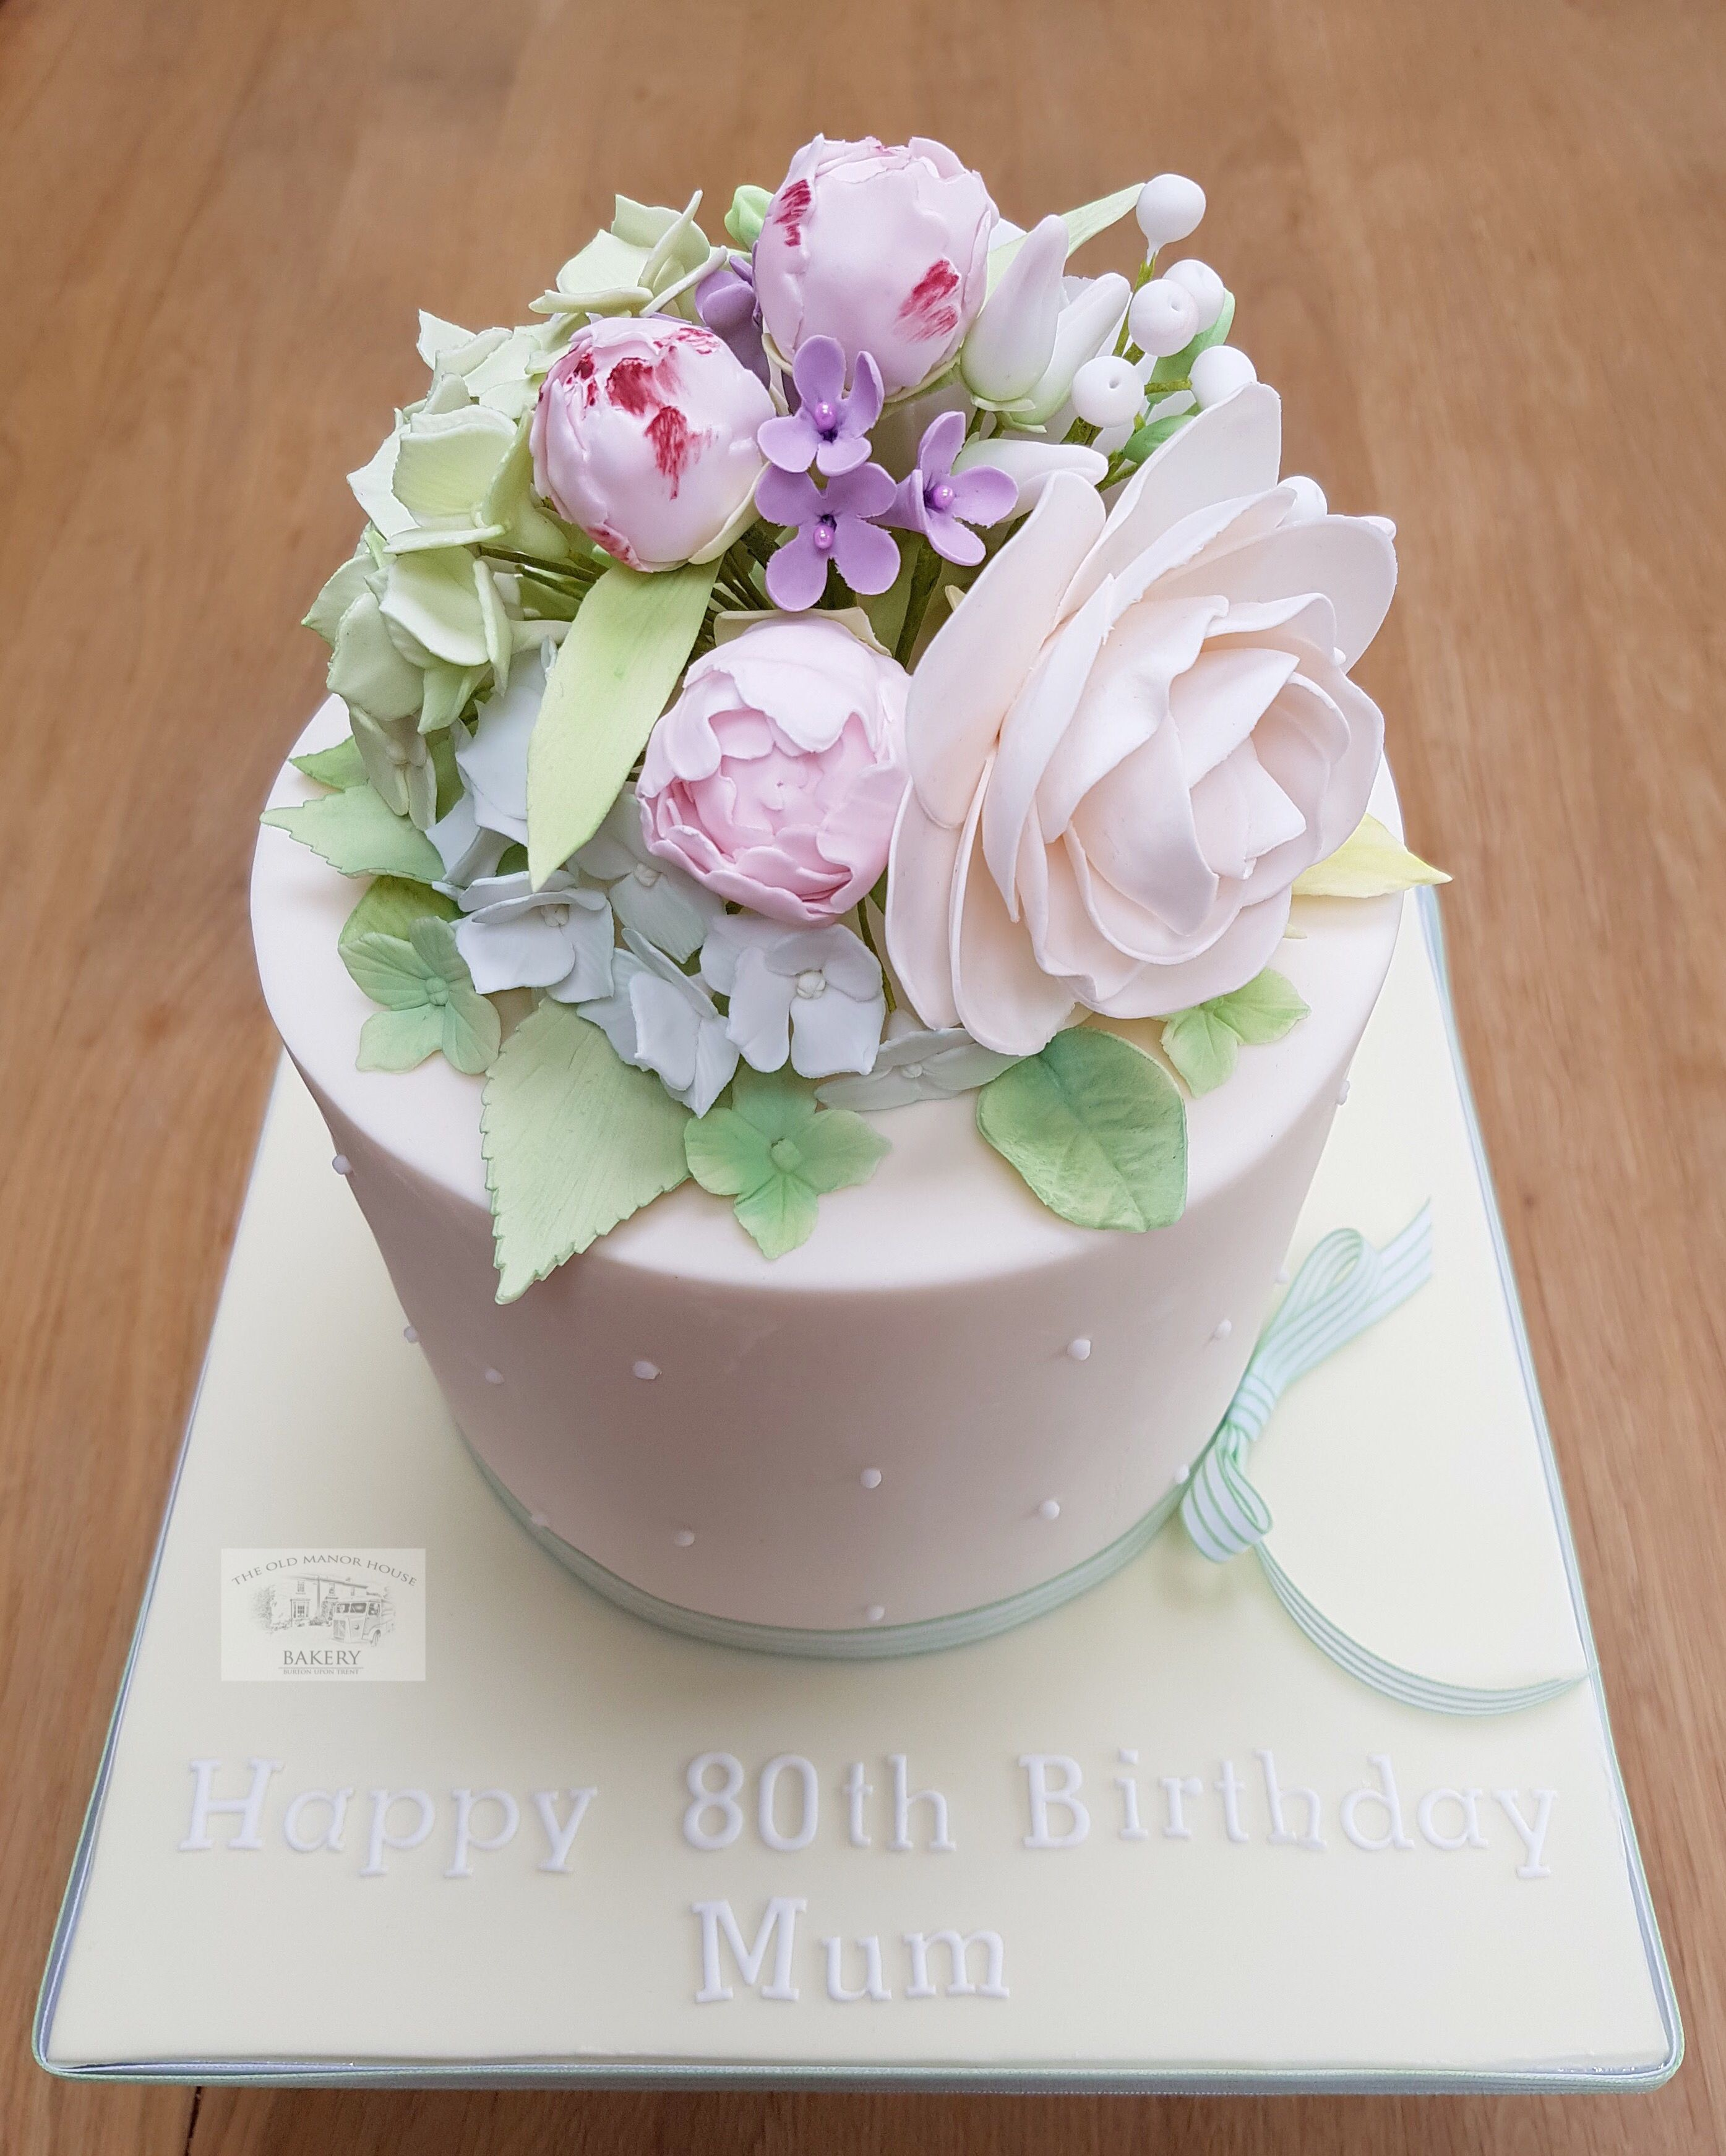 Ladies 80th birthday cake with posy of sugar flowers